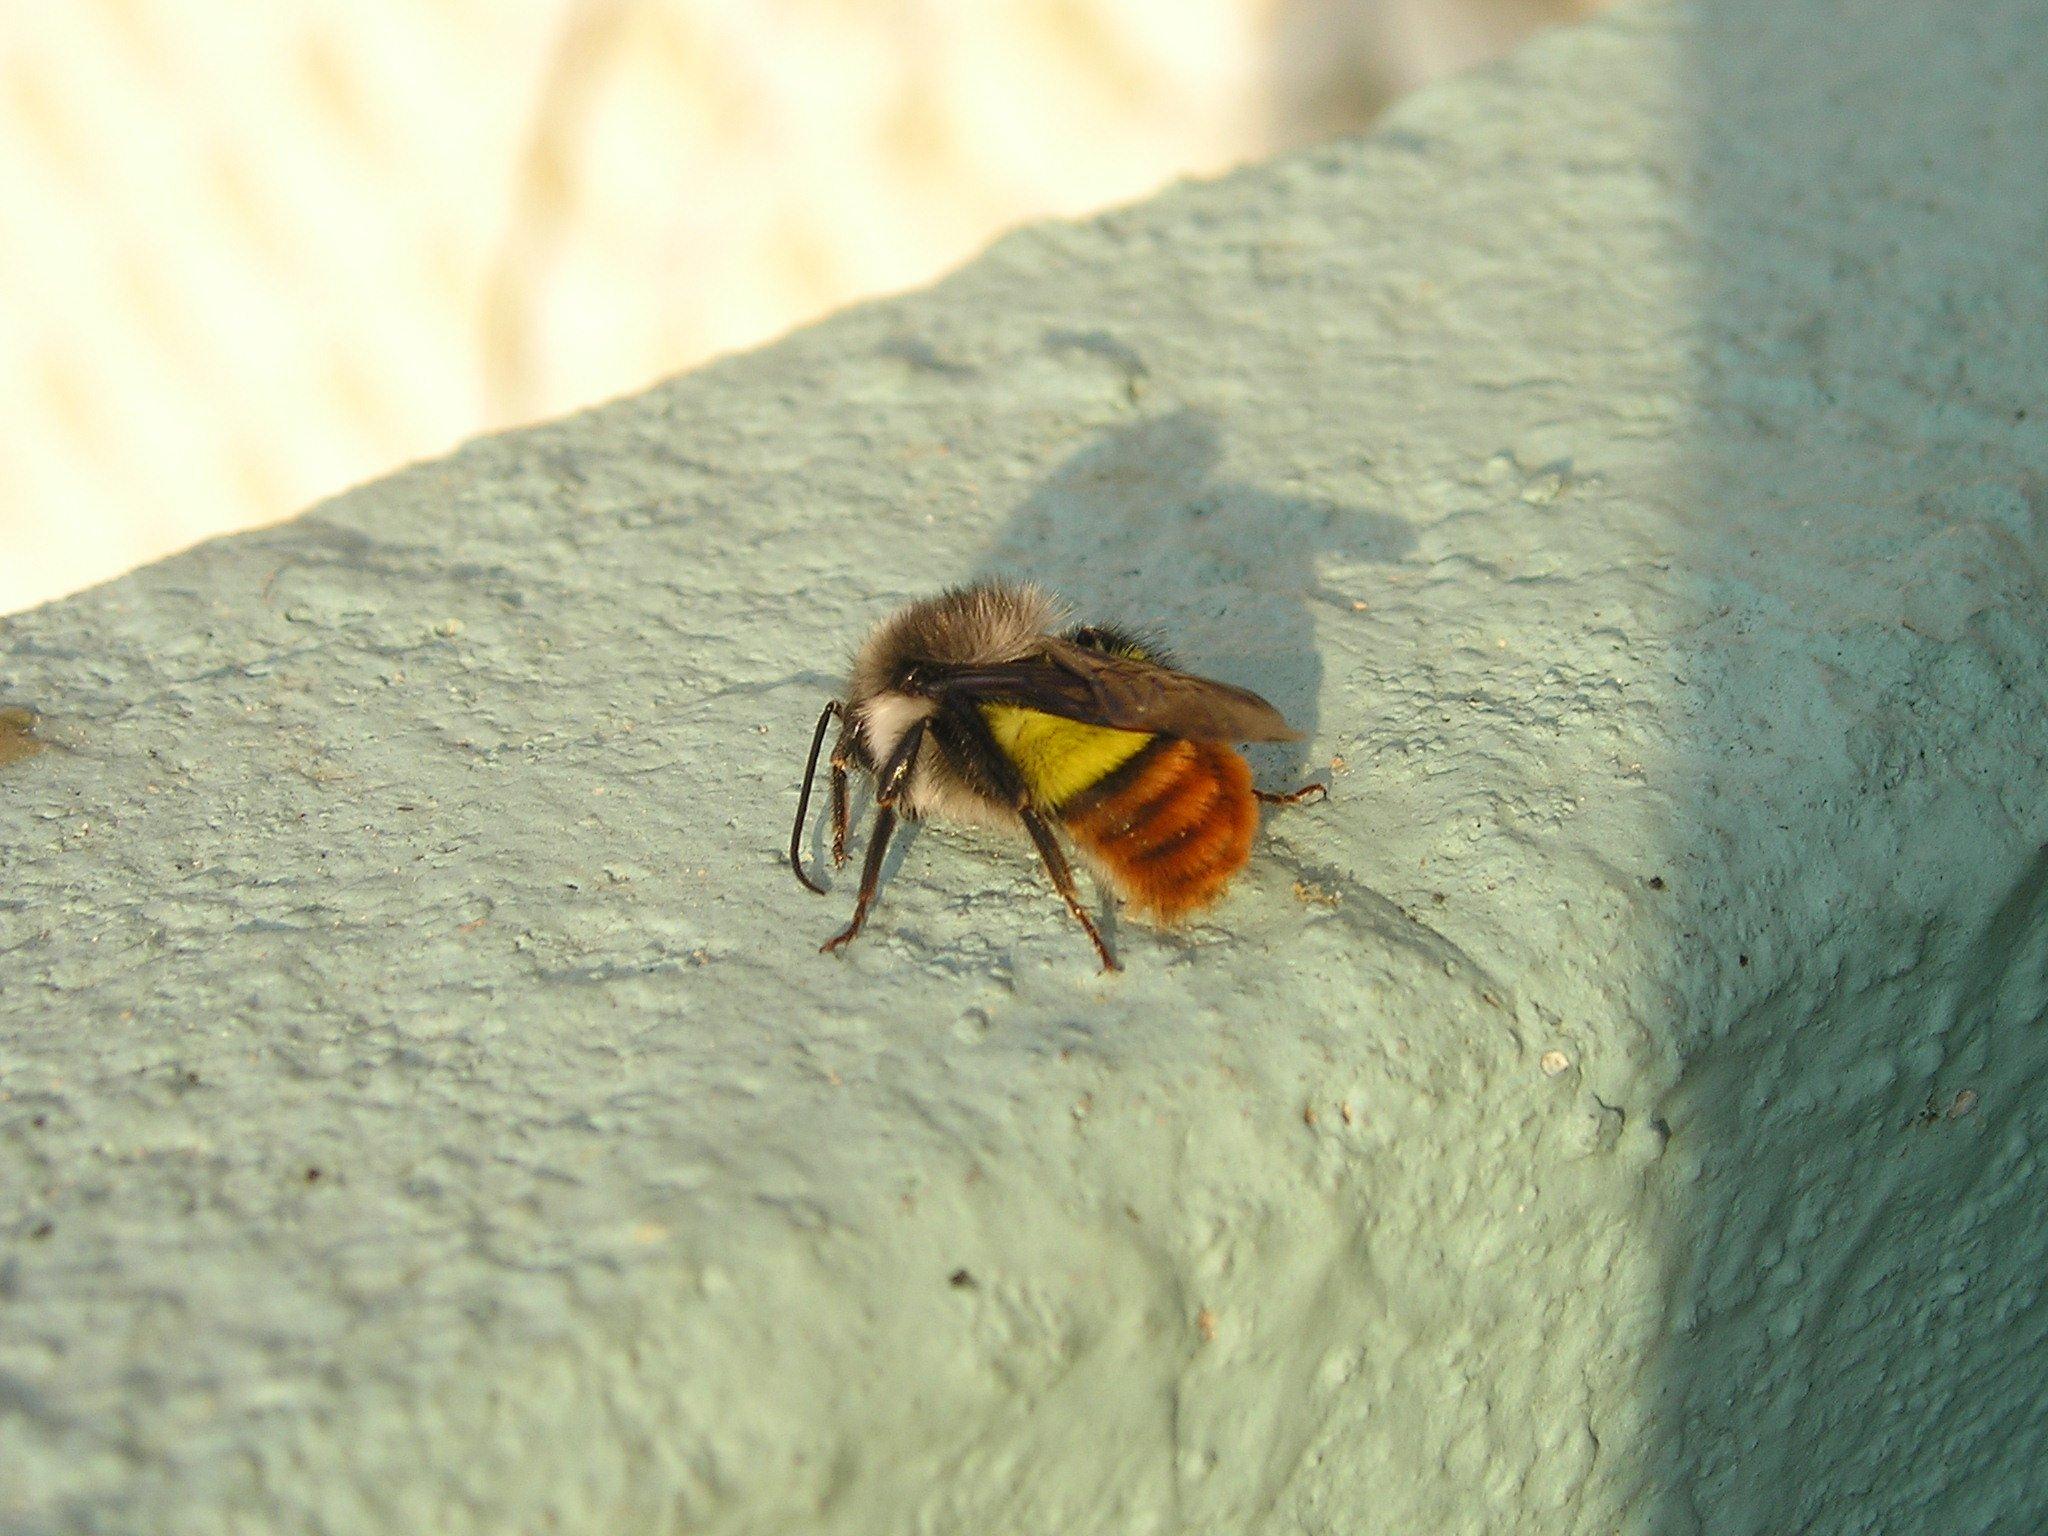 Fotos gratis  ala hoja mosca naranja insecto amarillo fauna